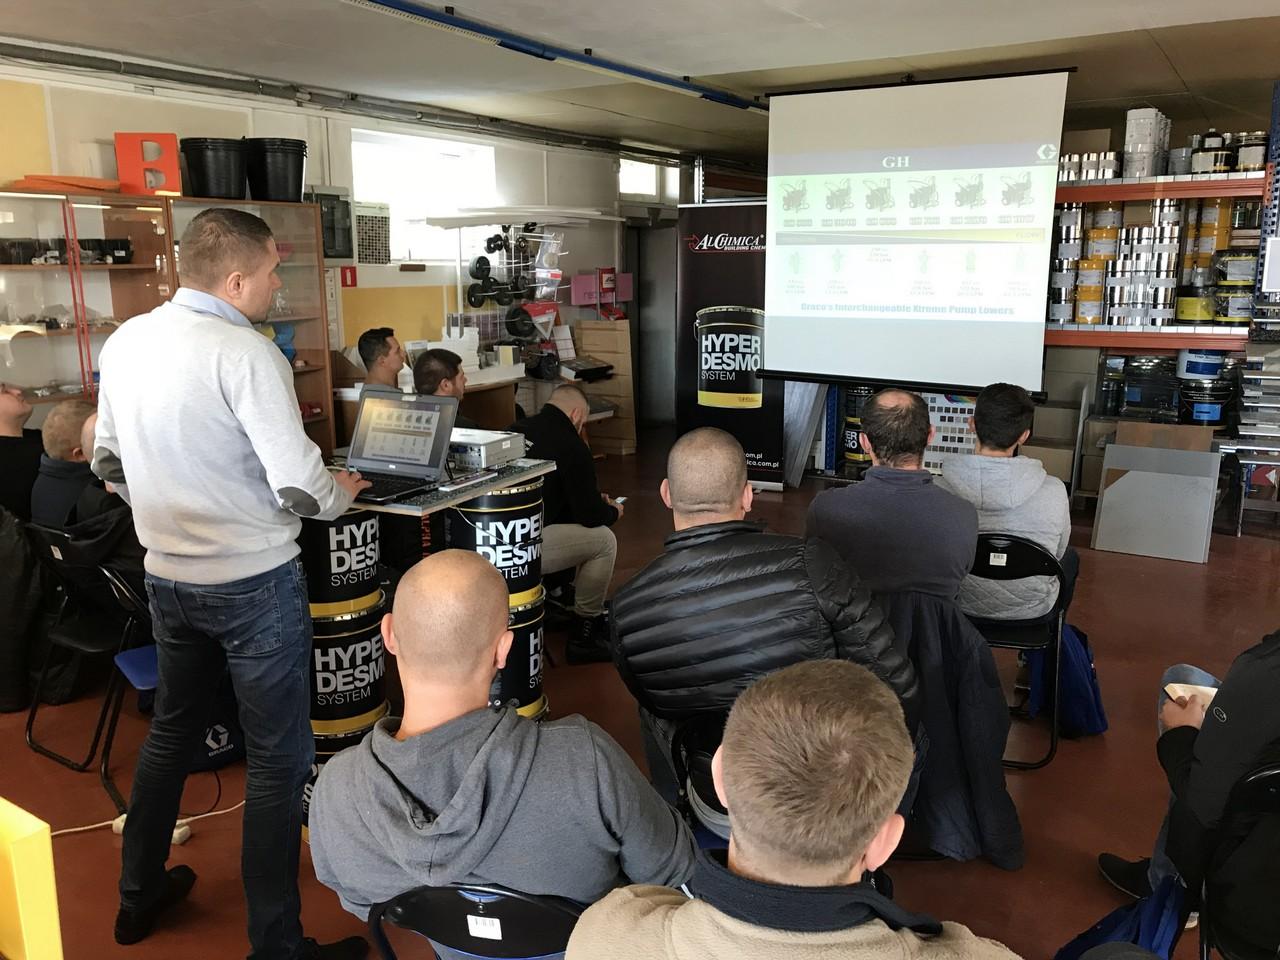 Szkolenie: natrysk membran Hyperdesmo agregatem Graco GH 933